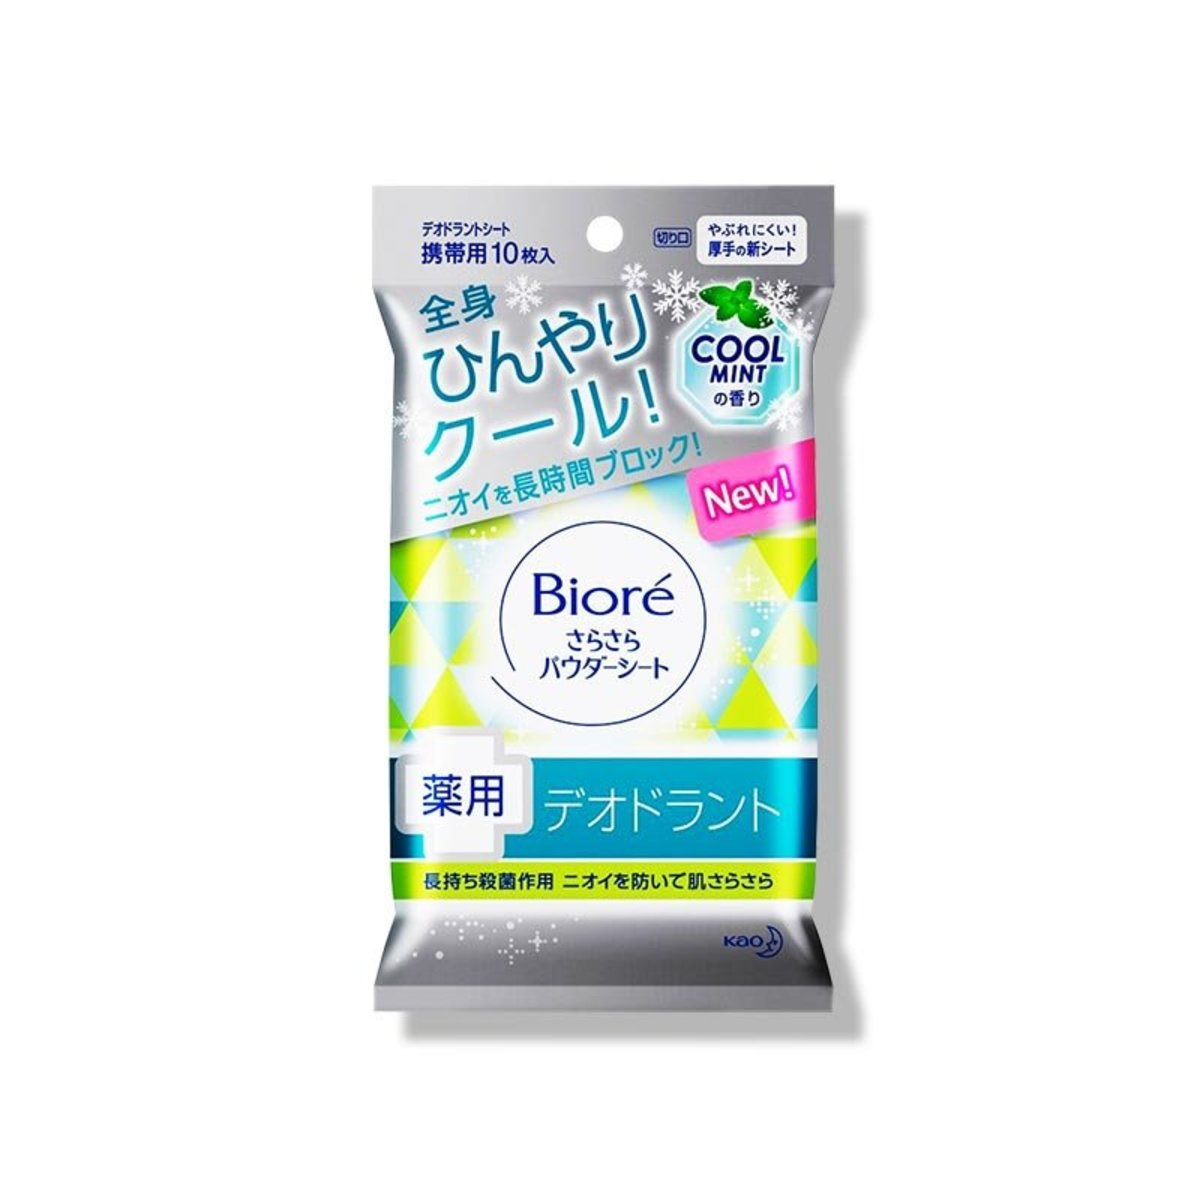 KAO Biore Moist Tissue (Cool Mint) 花王 碧柔  爽身粉濕紙巾 (清涼薄荷) 10枚(4901301299185)